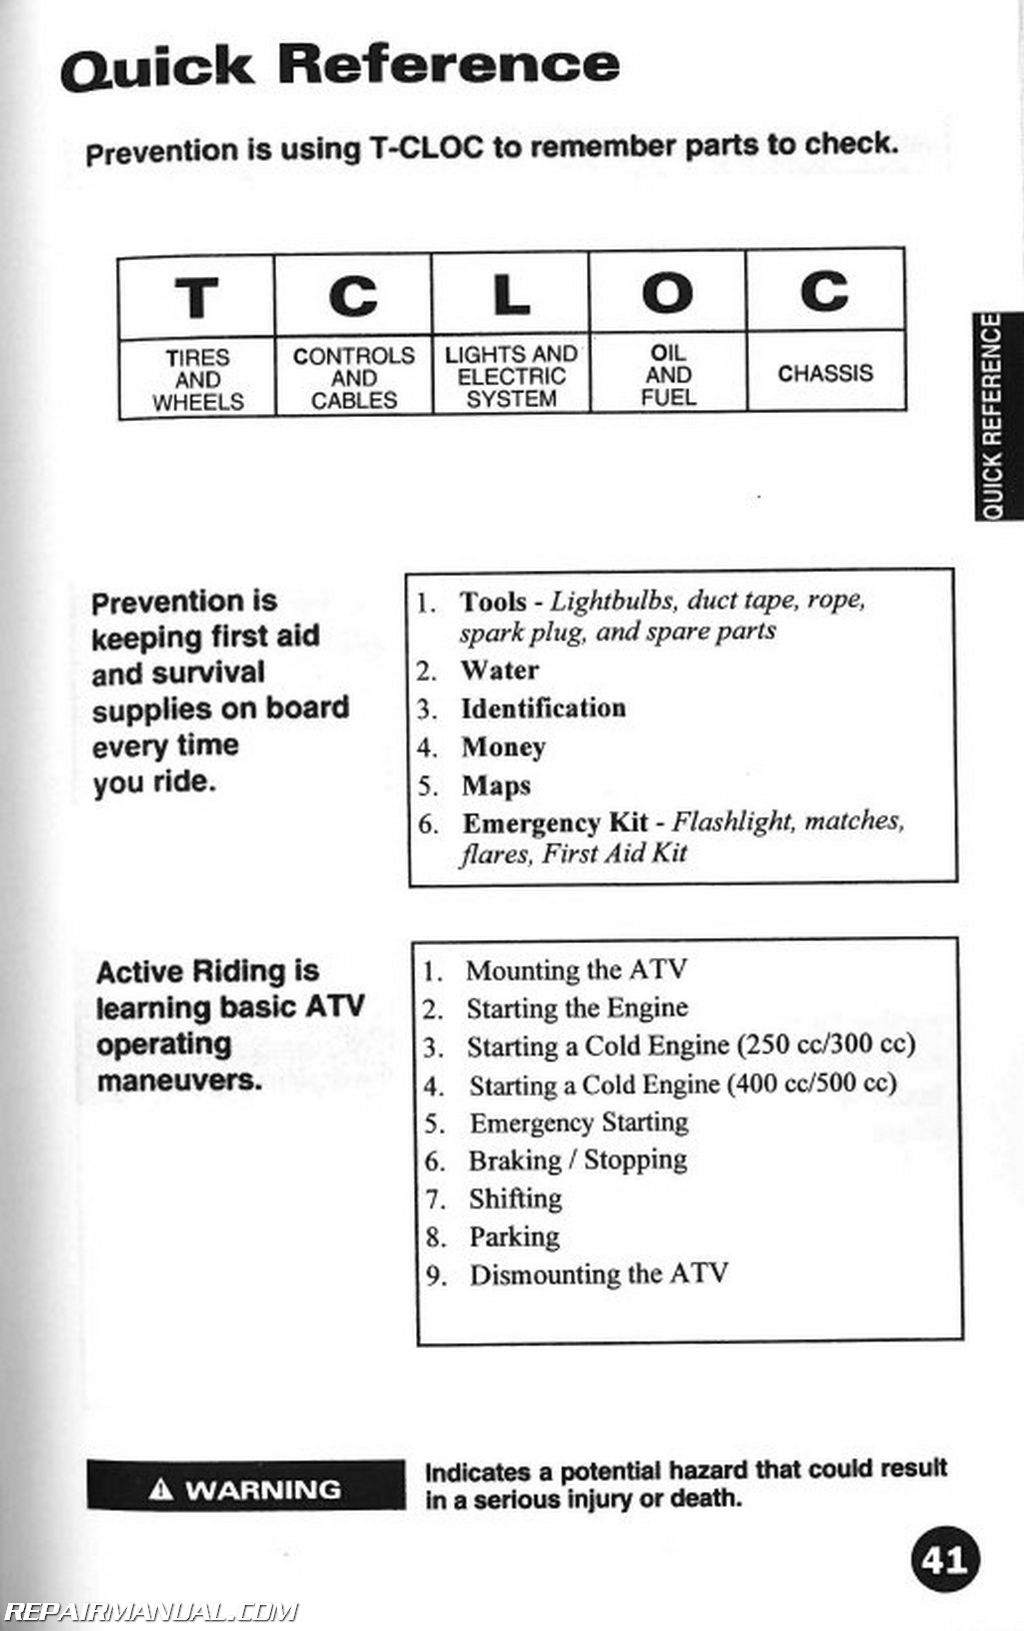 2000 arctic cat atv owners manual rh repairmanual com Arctic Cat 400 Parts Diagram 2001 Arctic Cat 300 Carburetor